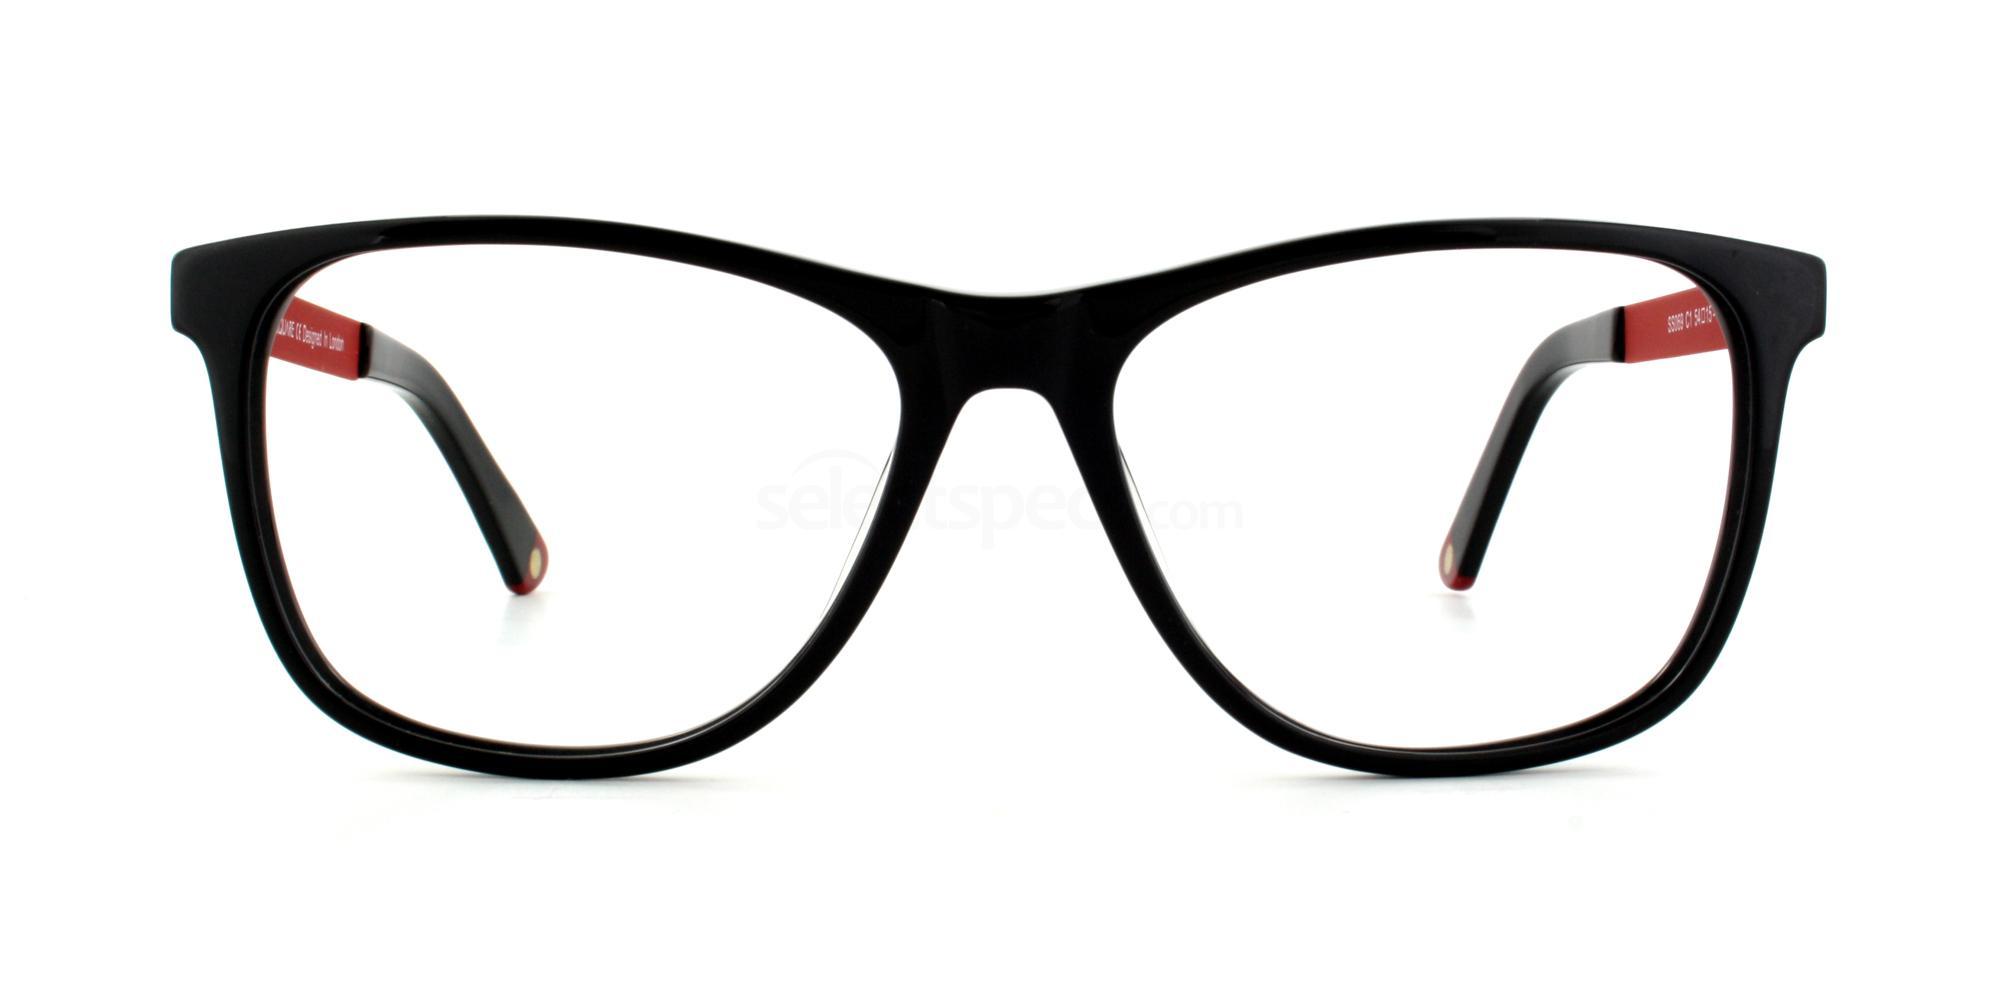 C1 SS 069 Glasses, Soho Square